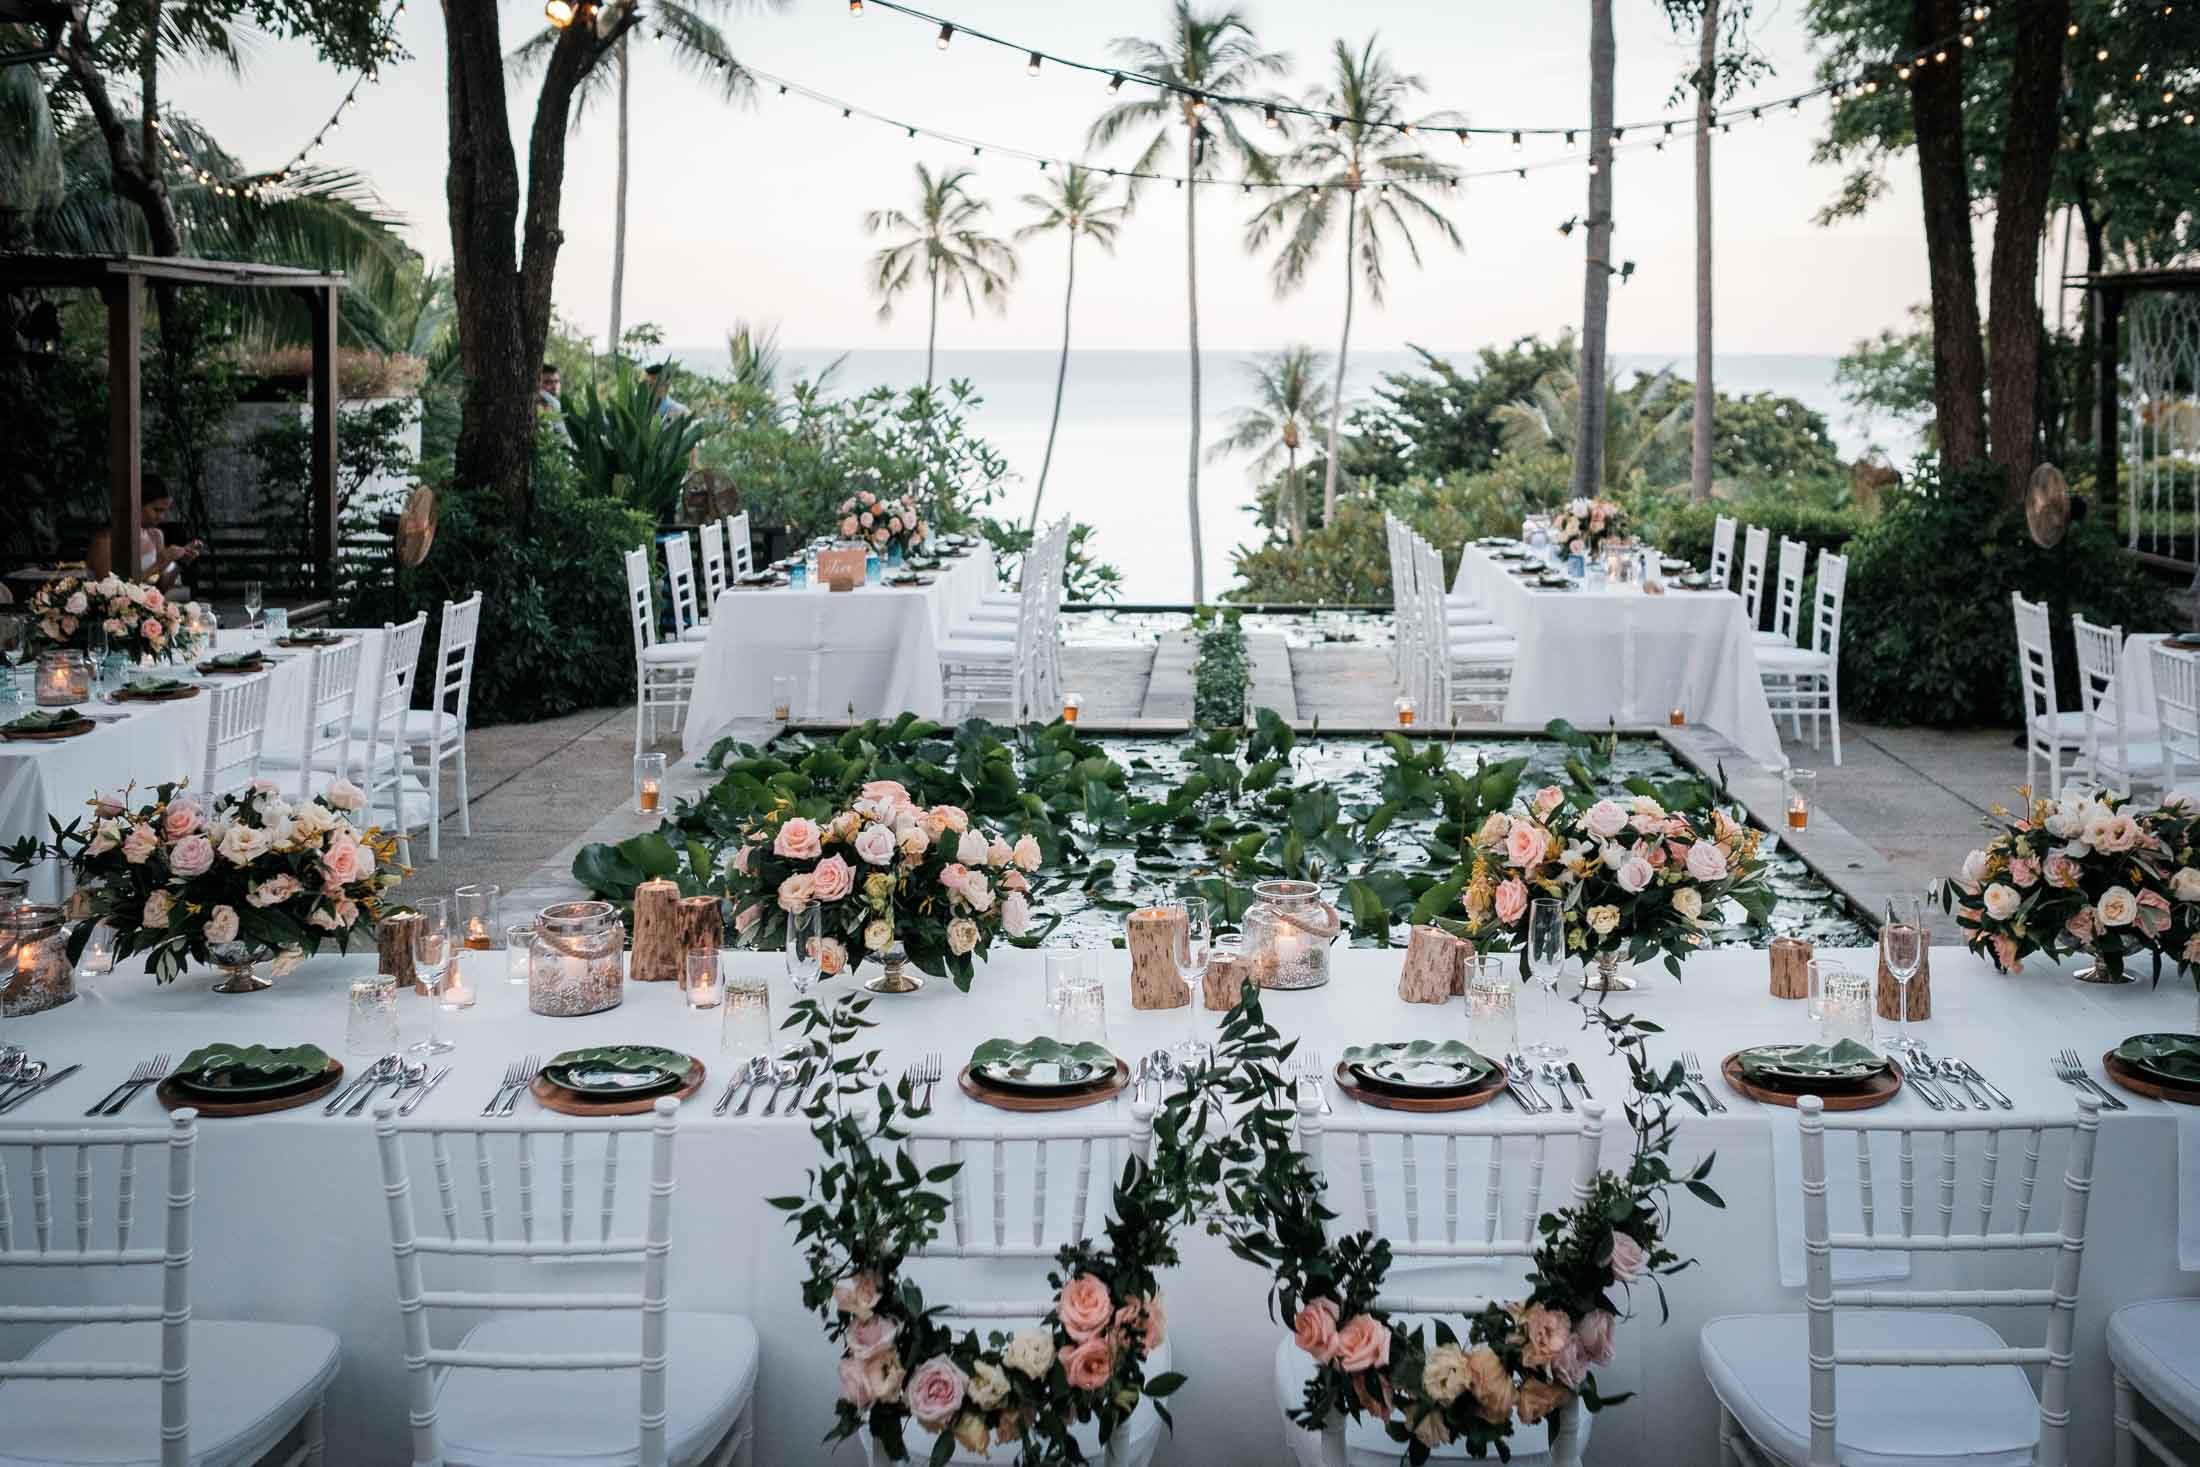 photographe mariage prestations inspiration mariage tropical